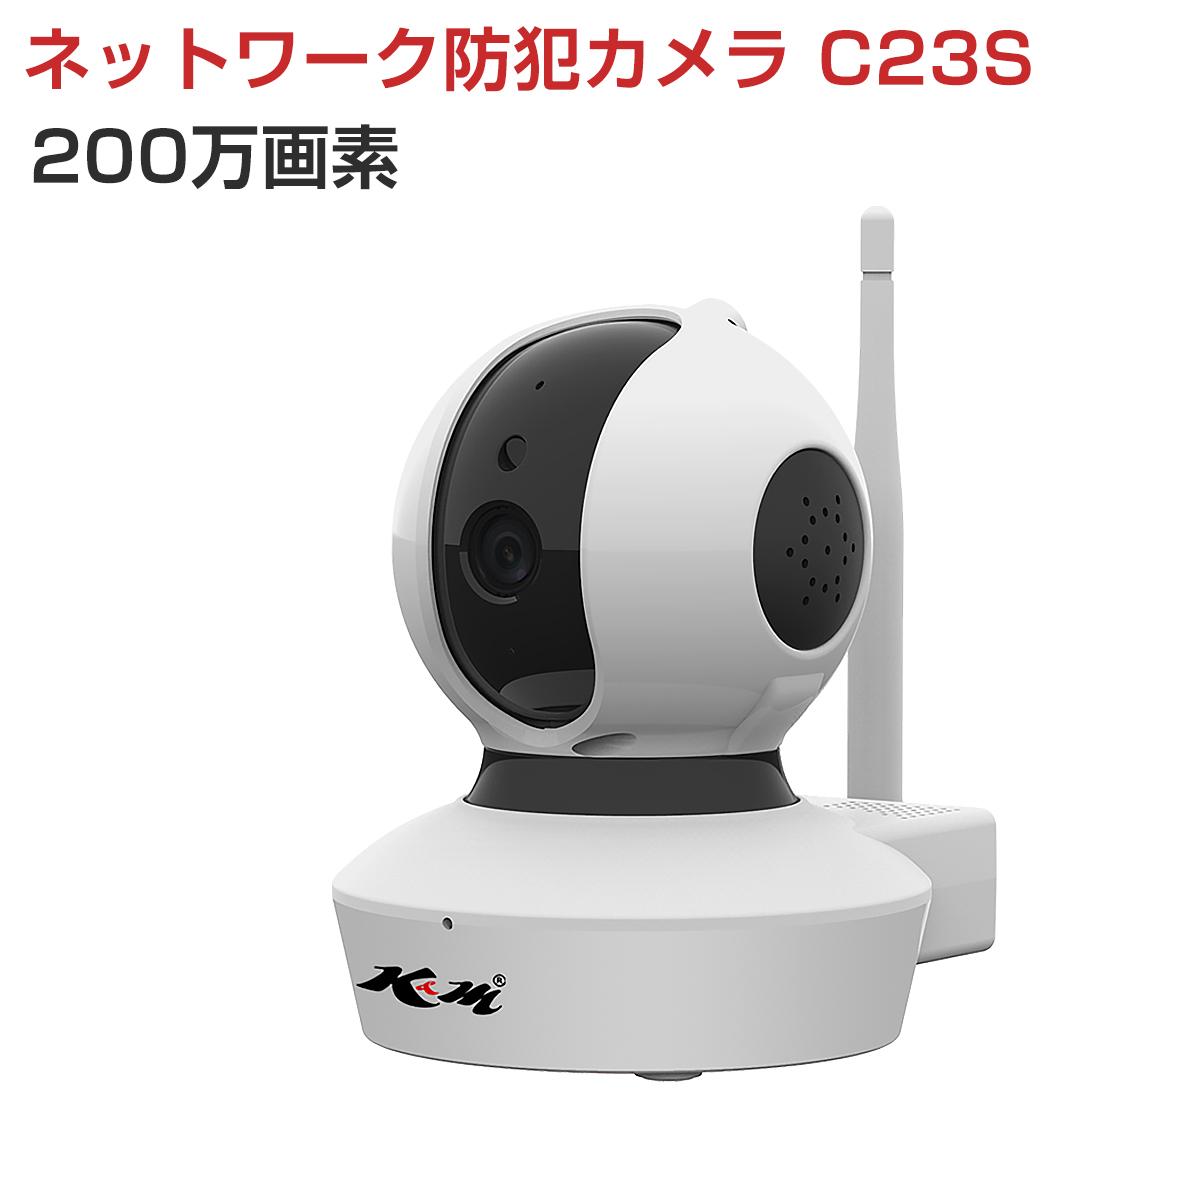 SDL 防犯カメラ 200万画素 C7823 新モデル ペット ベビーモニター VStarcam ワイヤレス 無線WIFI MicroSDカード録画 電源繋ぐだけ 屋内用 監視 ネットワーク IP WEB カメラ 宅配便送料無料 PSE 技適 1年保証 K&M